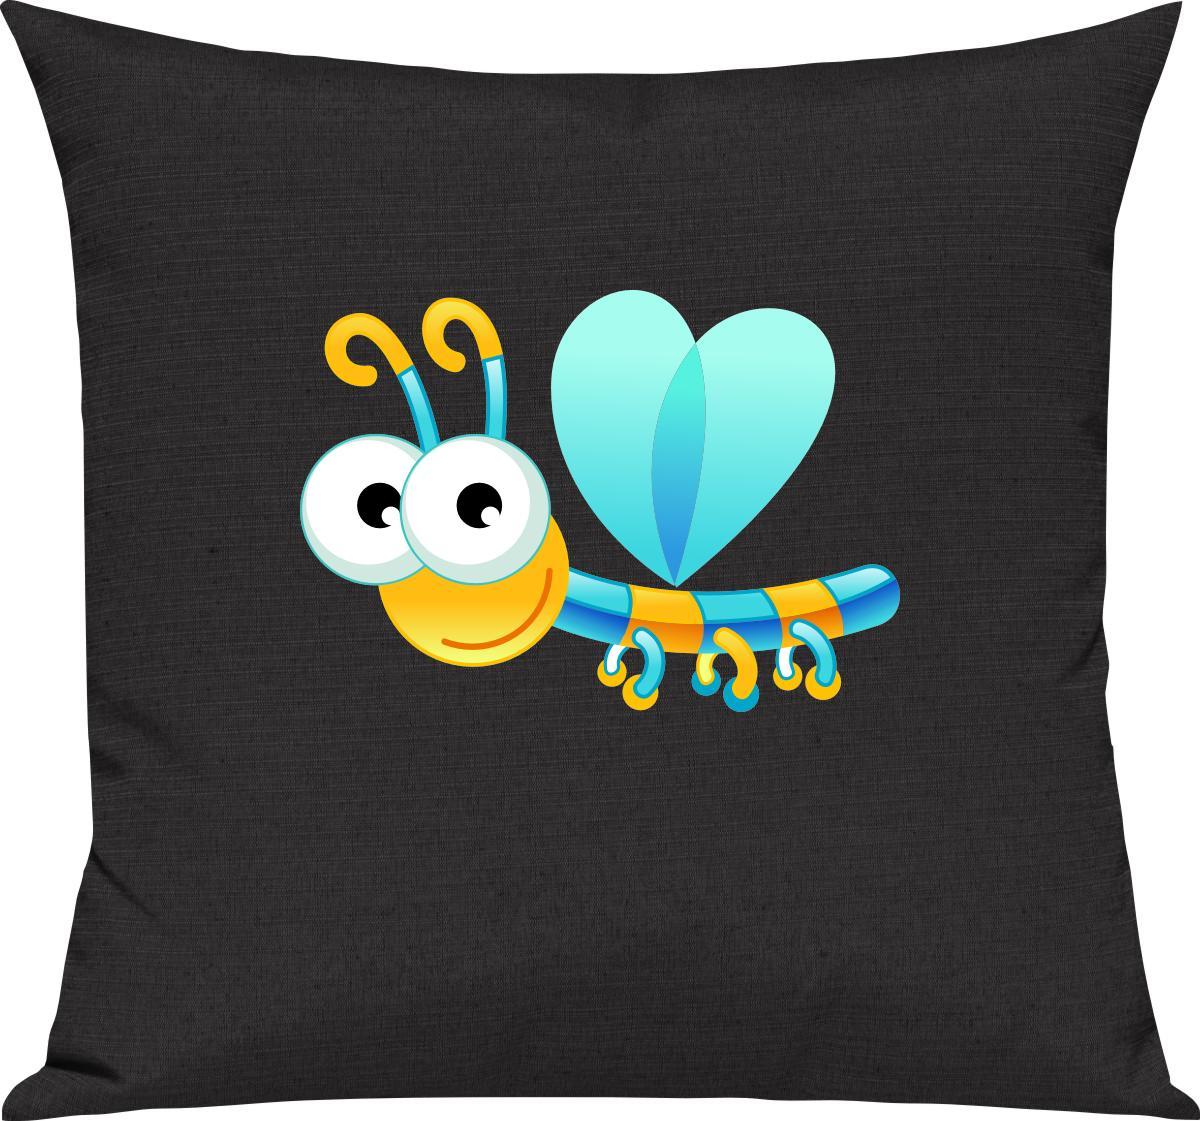 Indexbild 15 - Kinder Kissen, Libelle Insekt Tiere Tier Natur, Kuschelkissen Couch Deko,